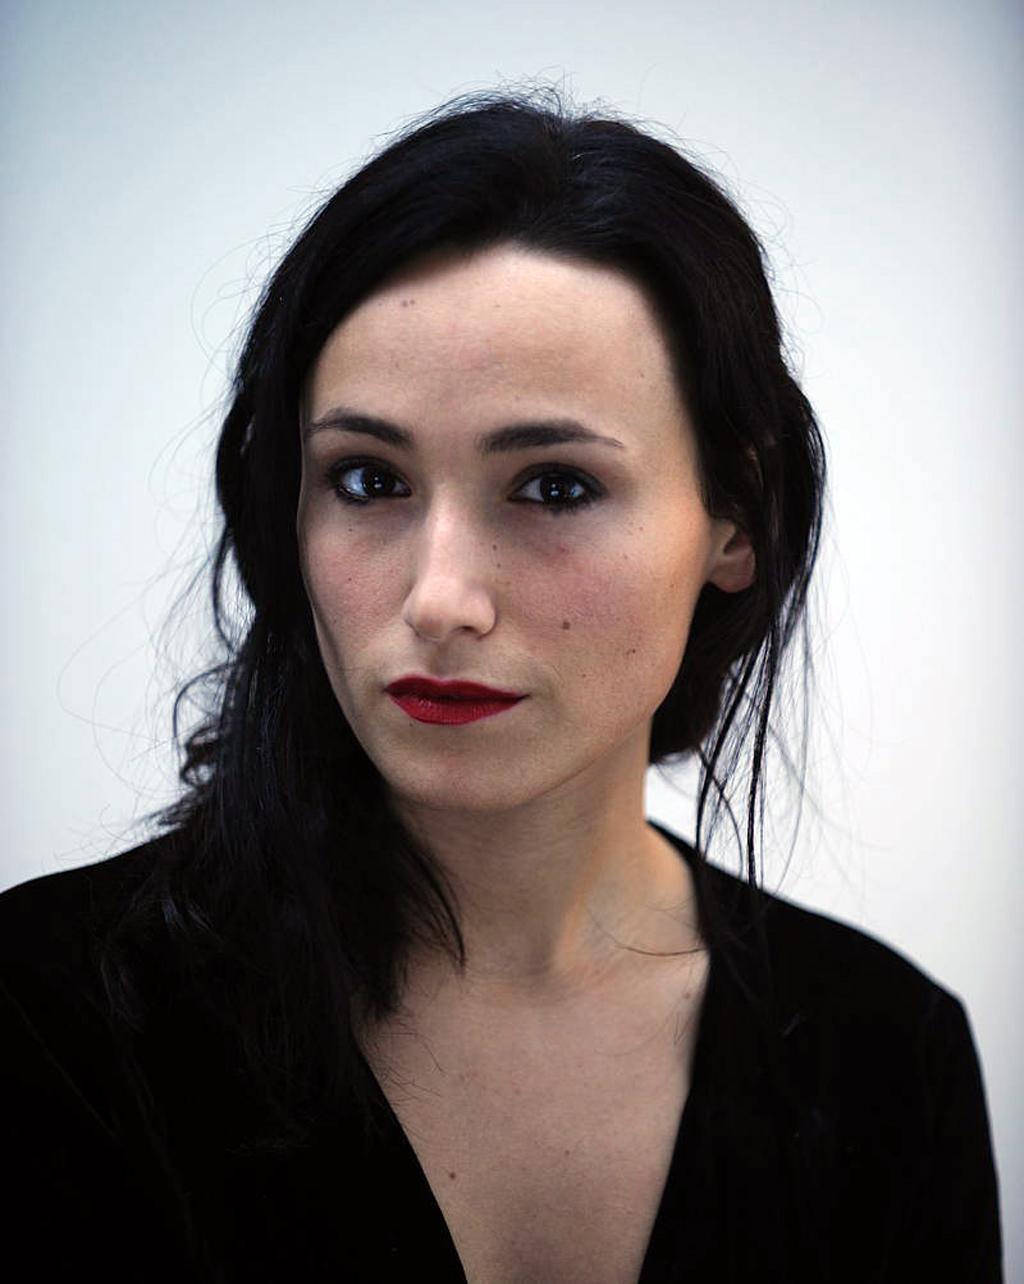 arijana-robert-schultze-2011-07